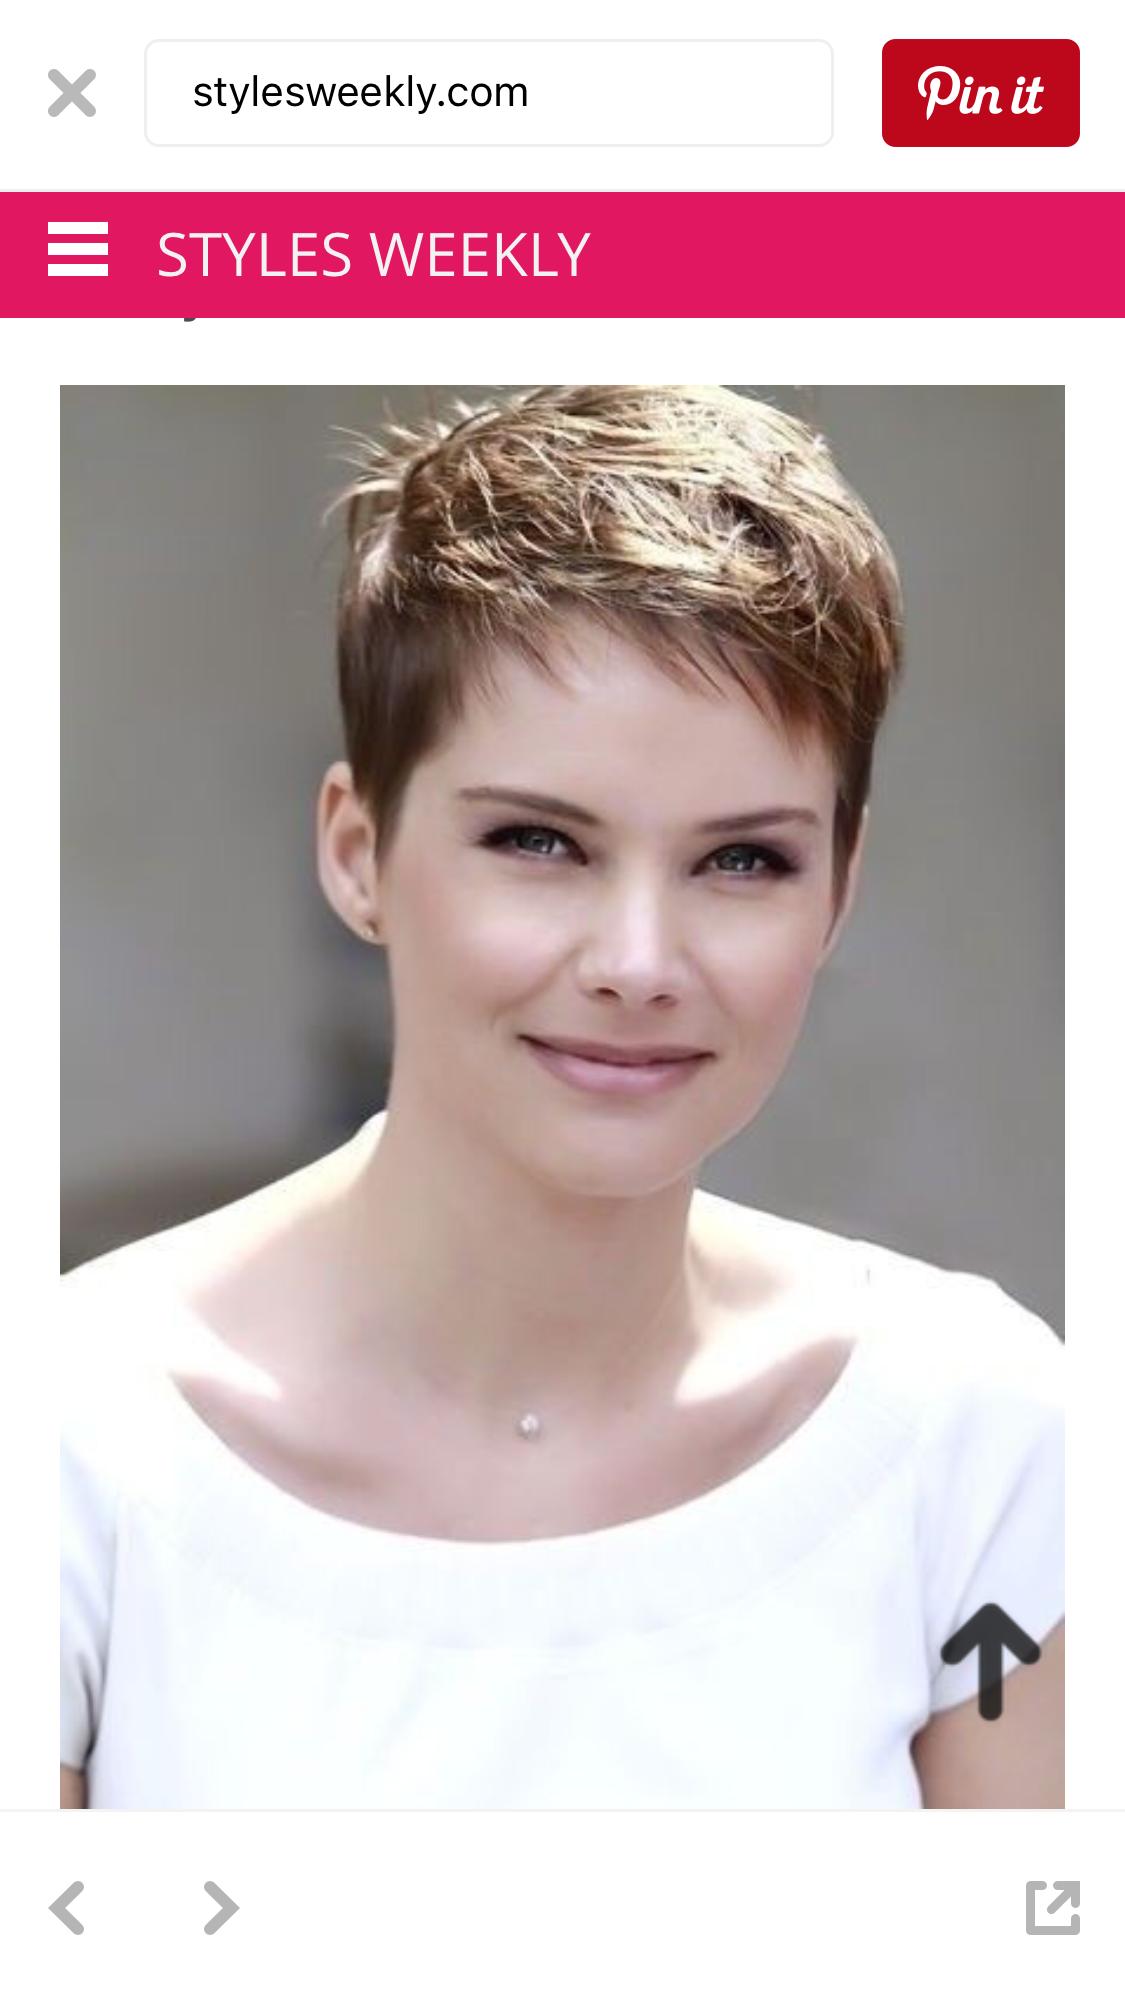 Haircut for men with round face short hair  womenus fashion  pinterest  short hair shorts and